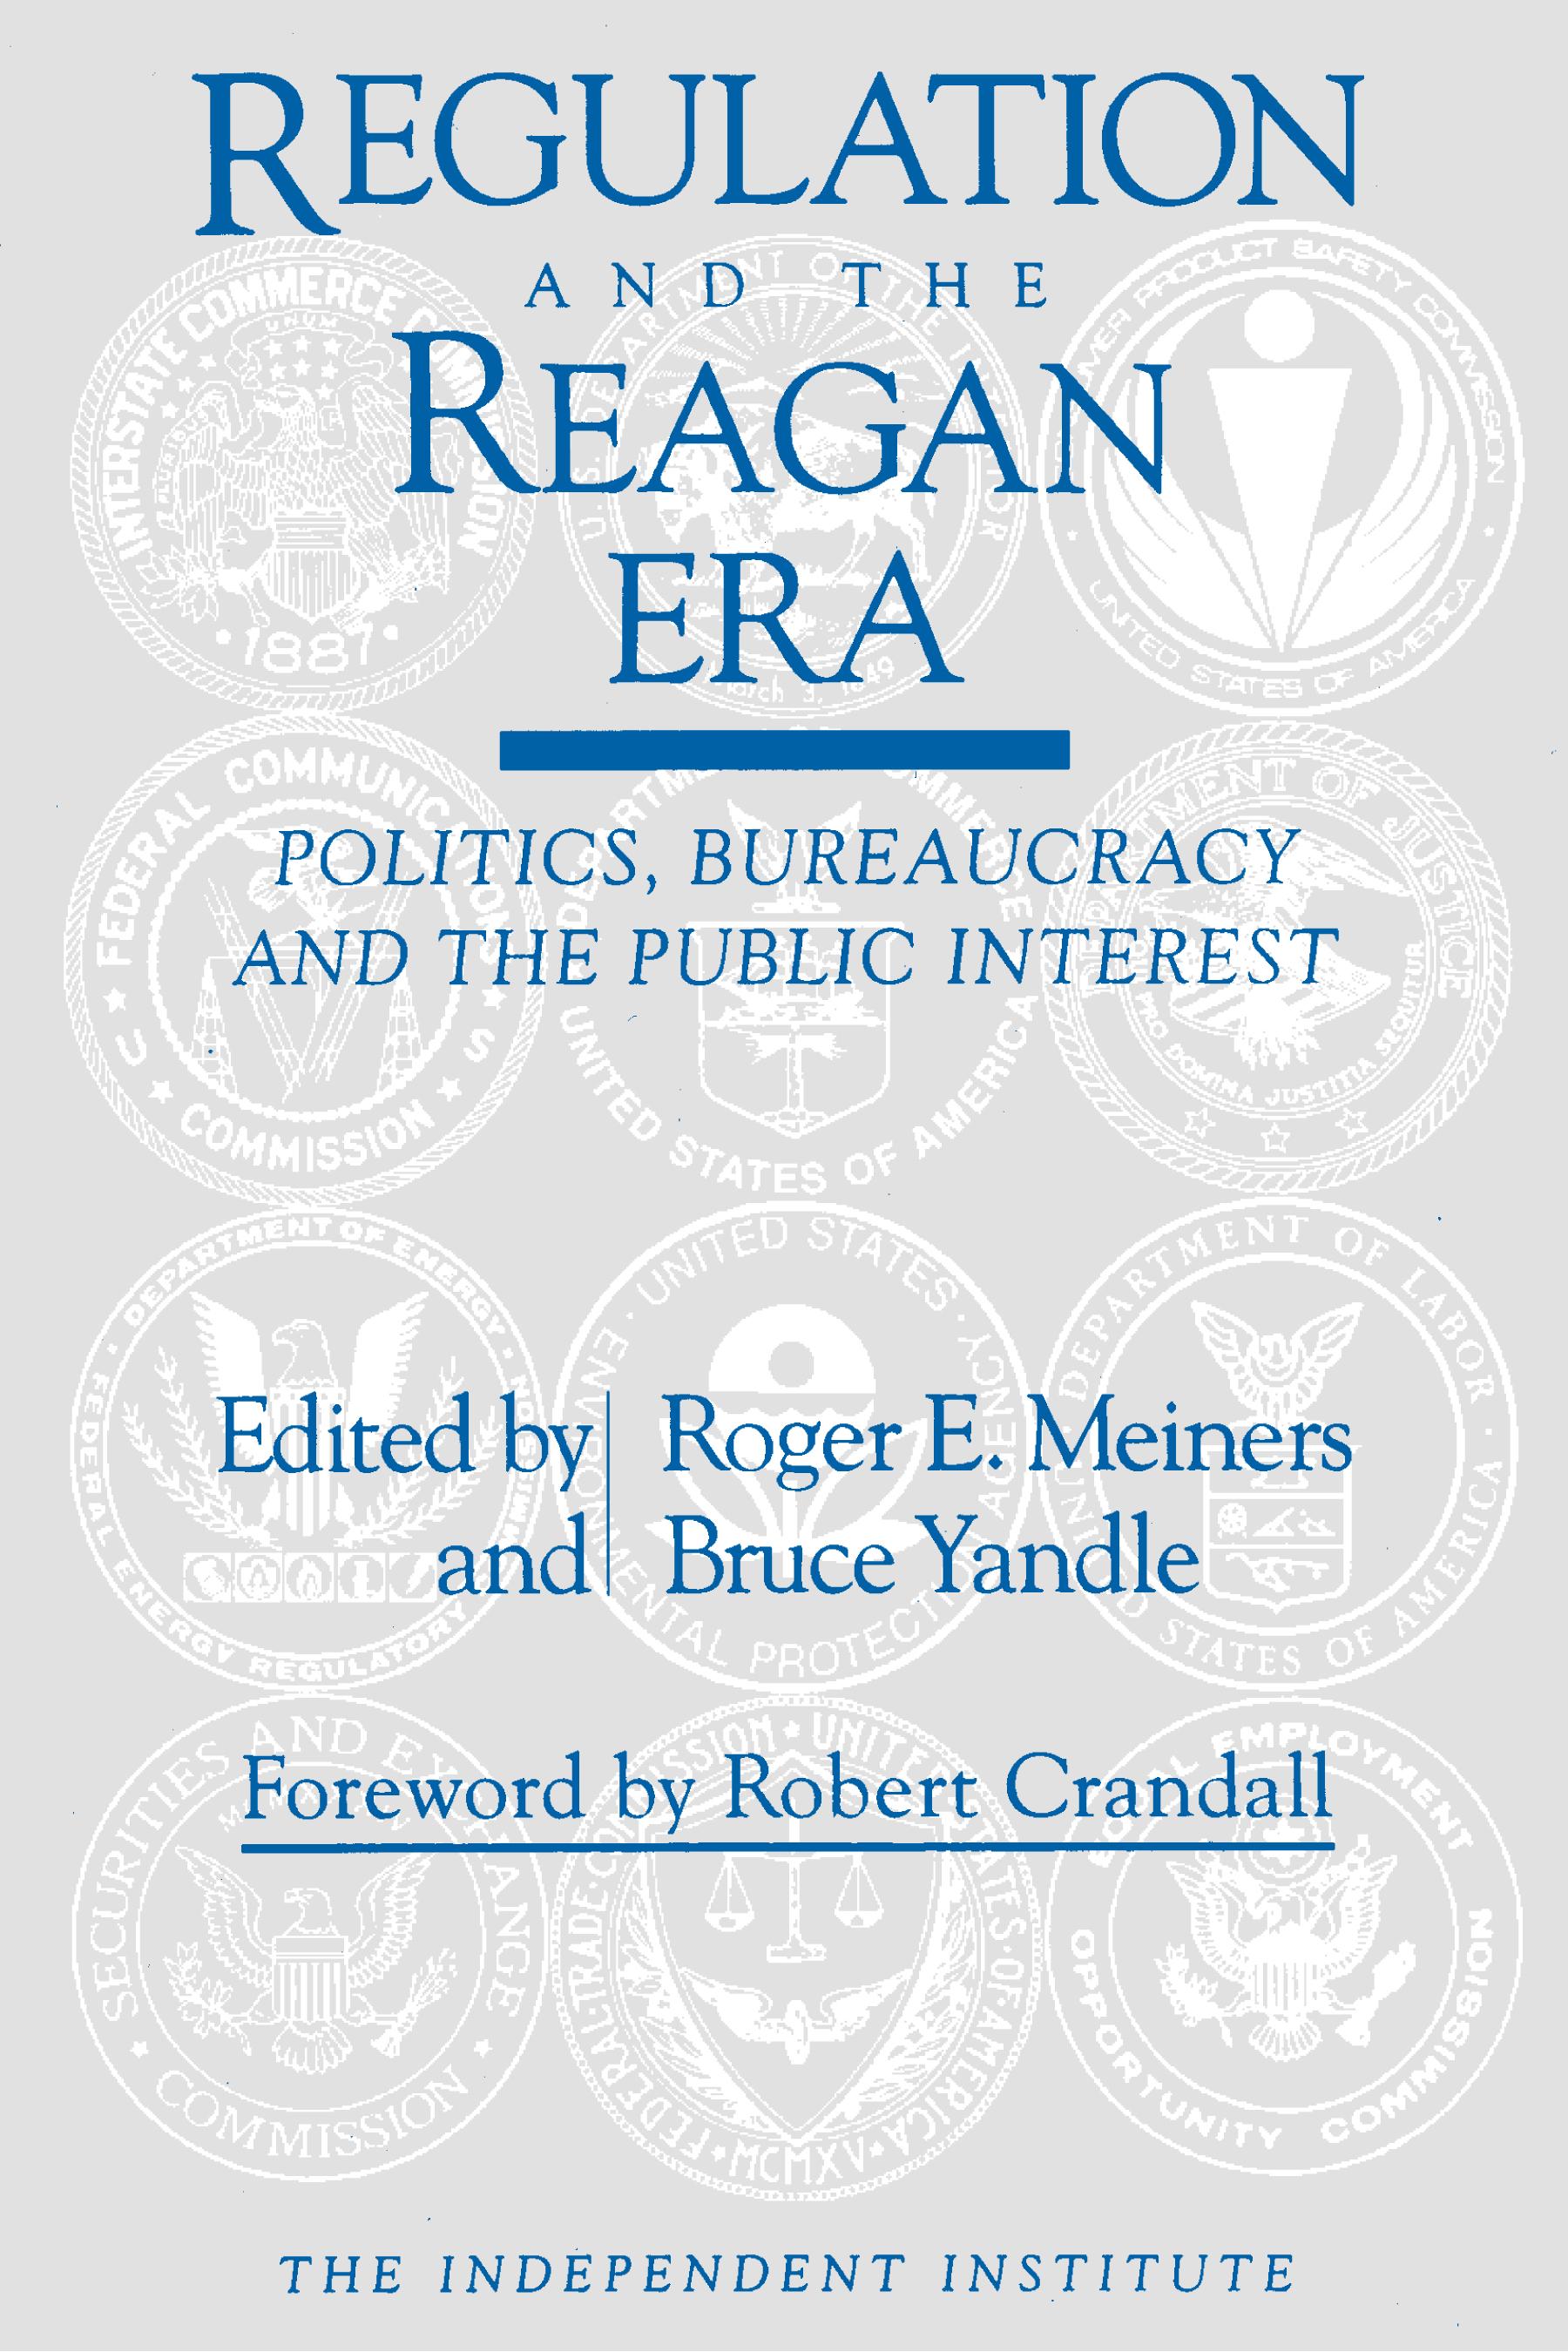 ronald reagan essay contest